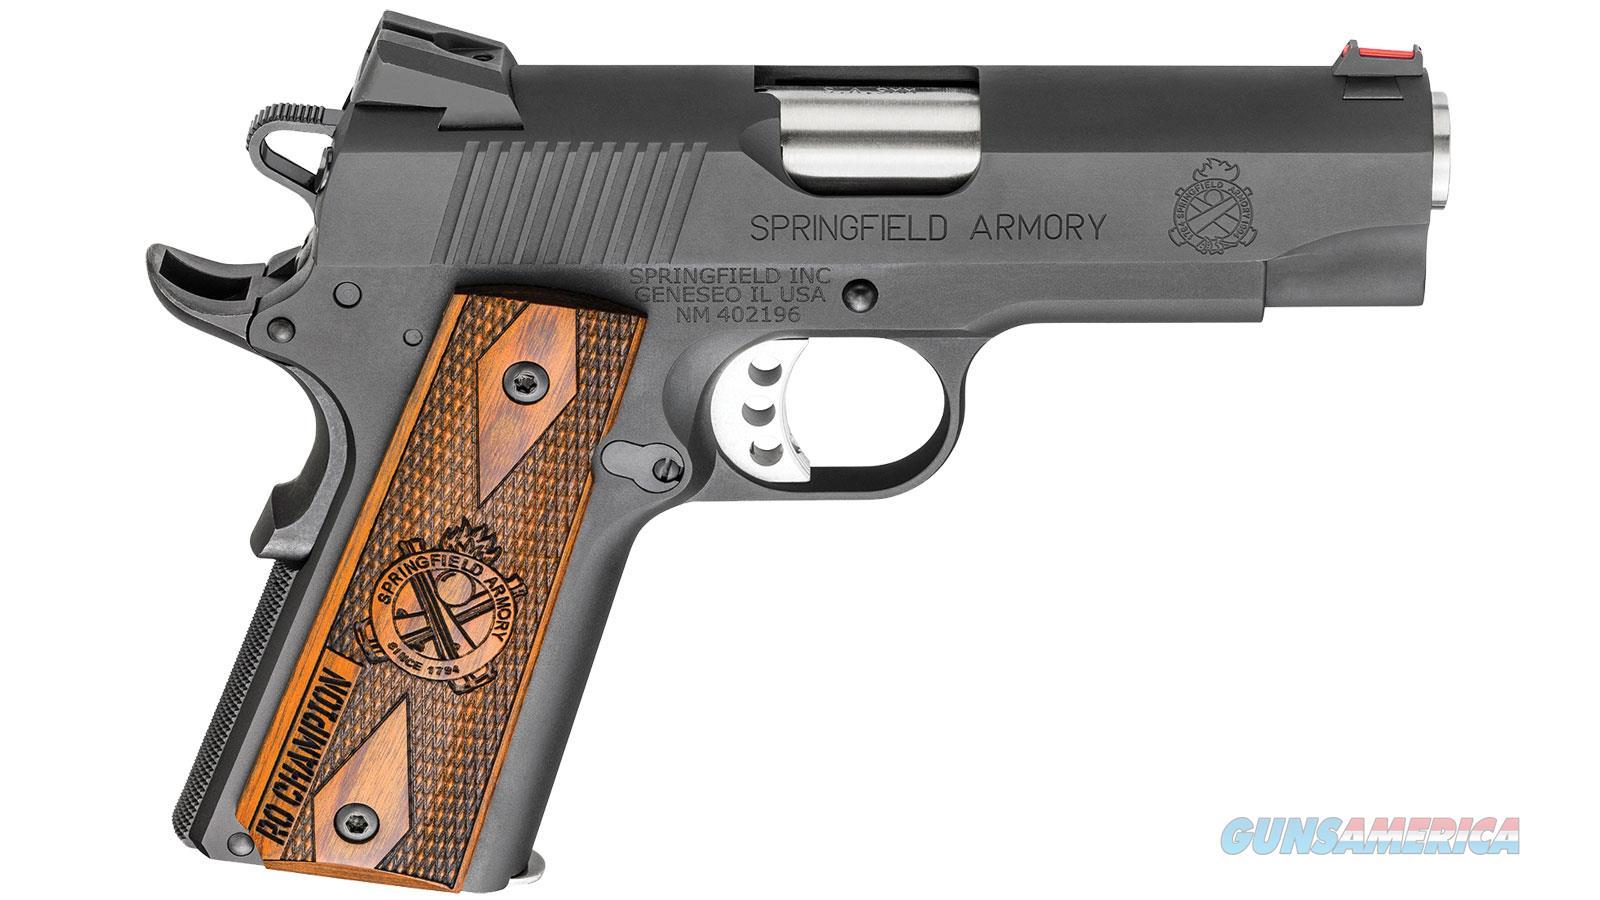 Springfield Armory 1911 9Mm Blk Ltwt Champion Range Officer PI9137L  Guns > Pistols > S Misc Pistols